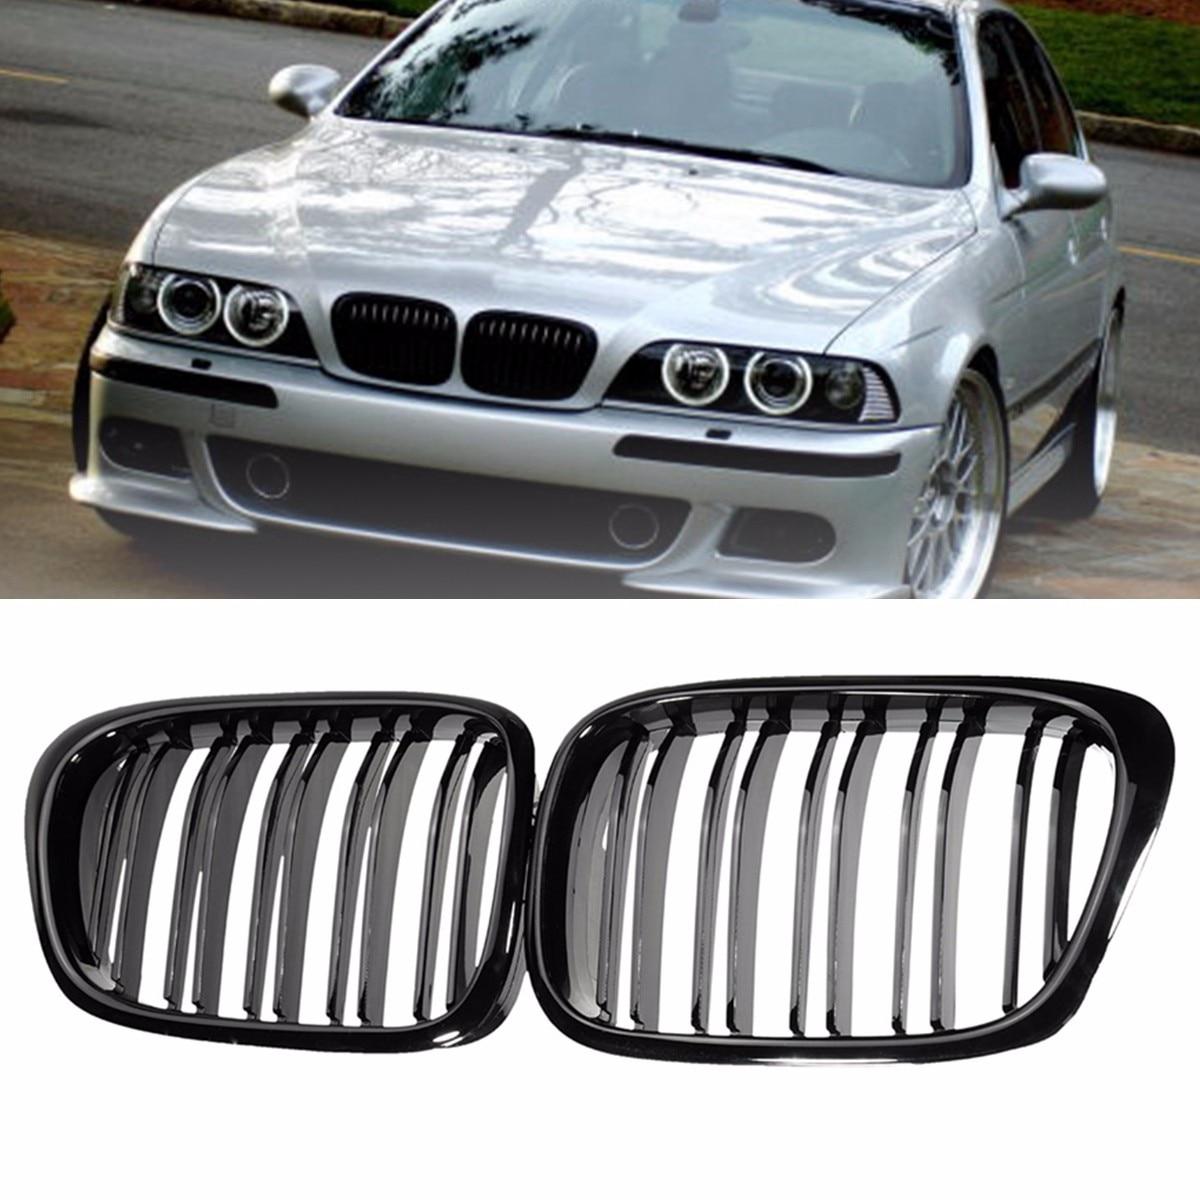 BMW 5 E39 1996-2003 CAR DOOR SILL PROTECTOR EXCLUSIVE chrome 4pcs